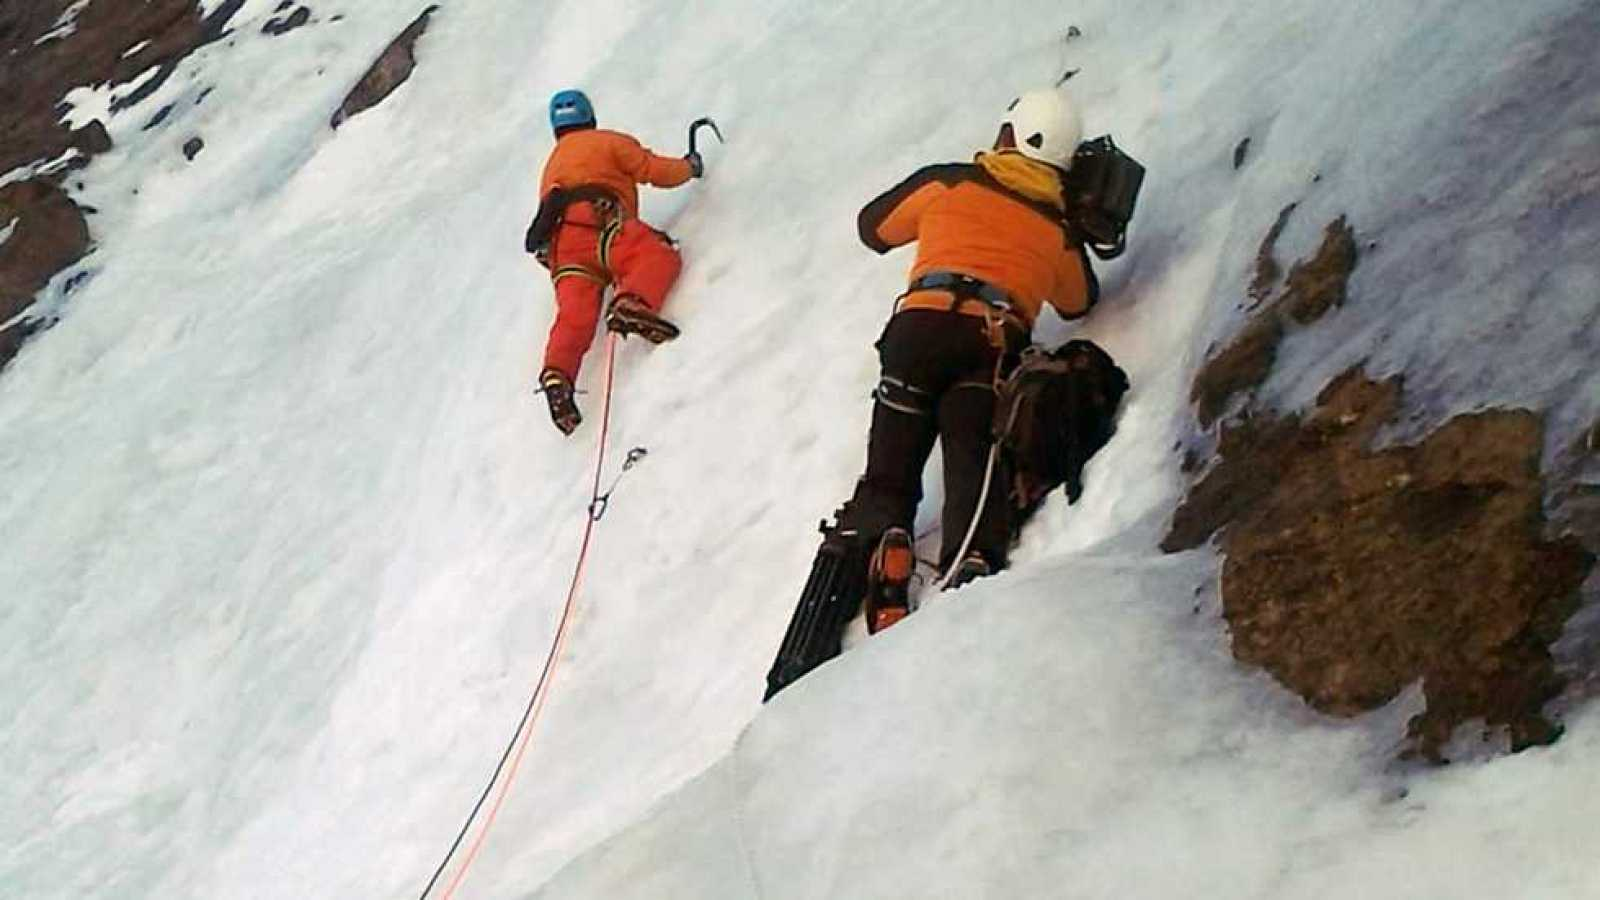 Escalada en hielo 1